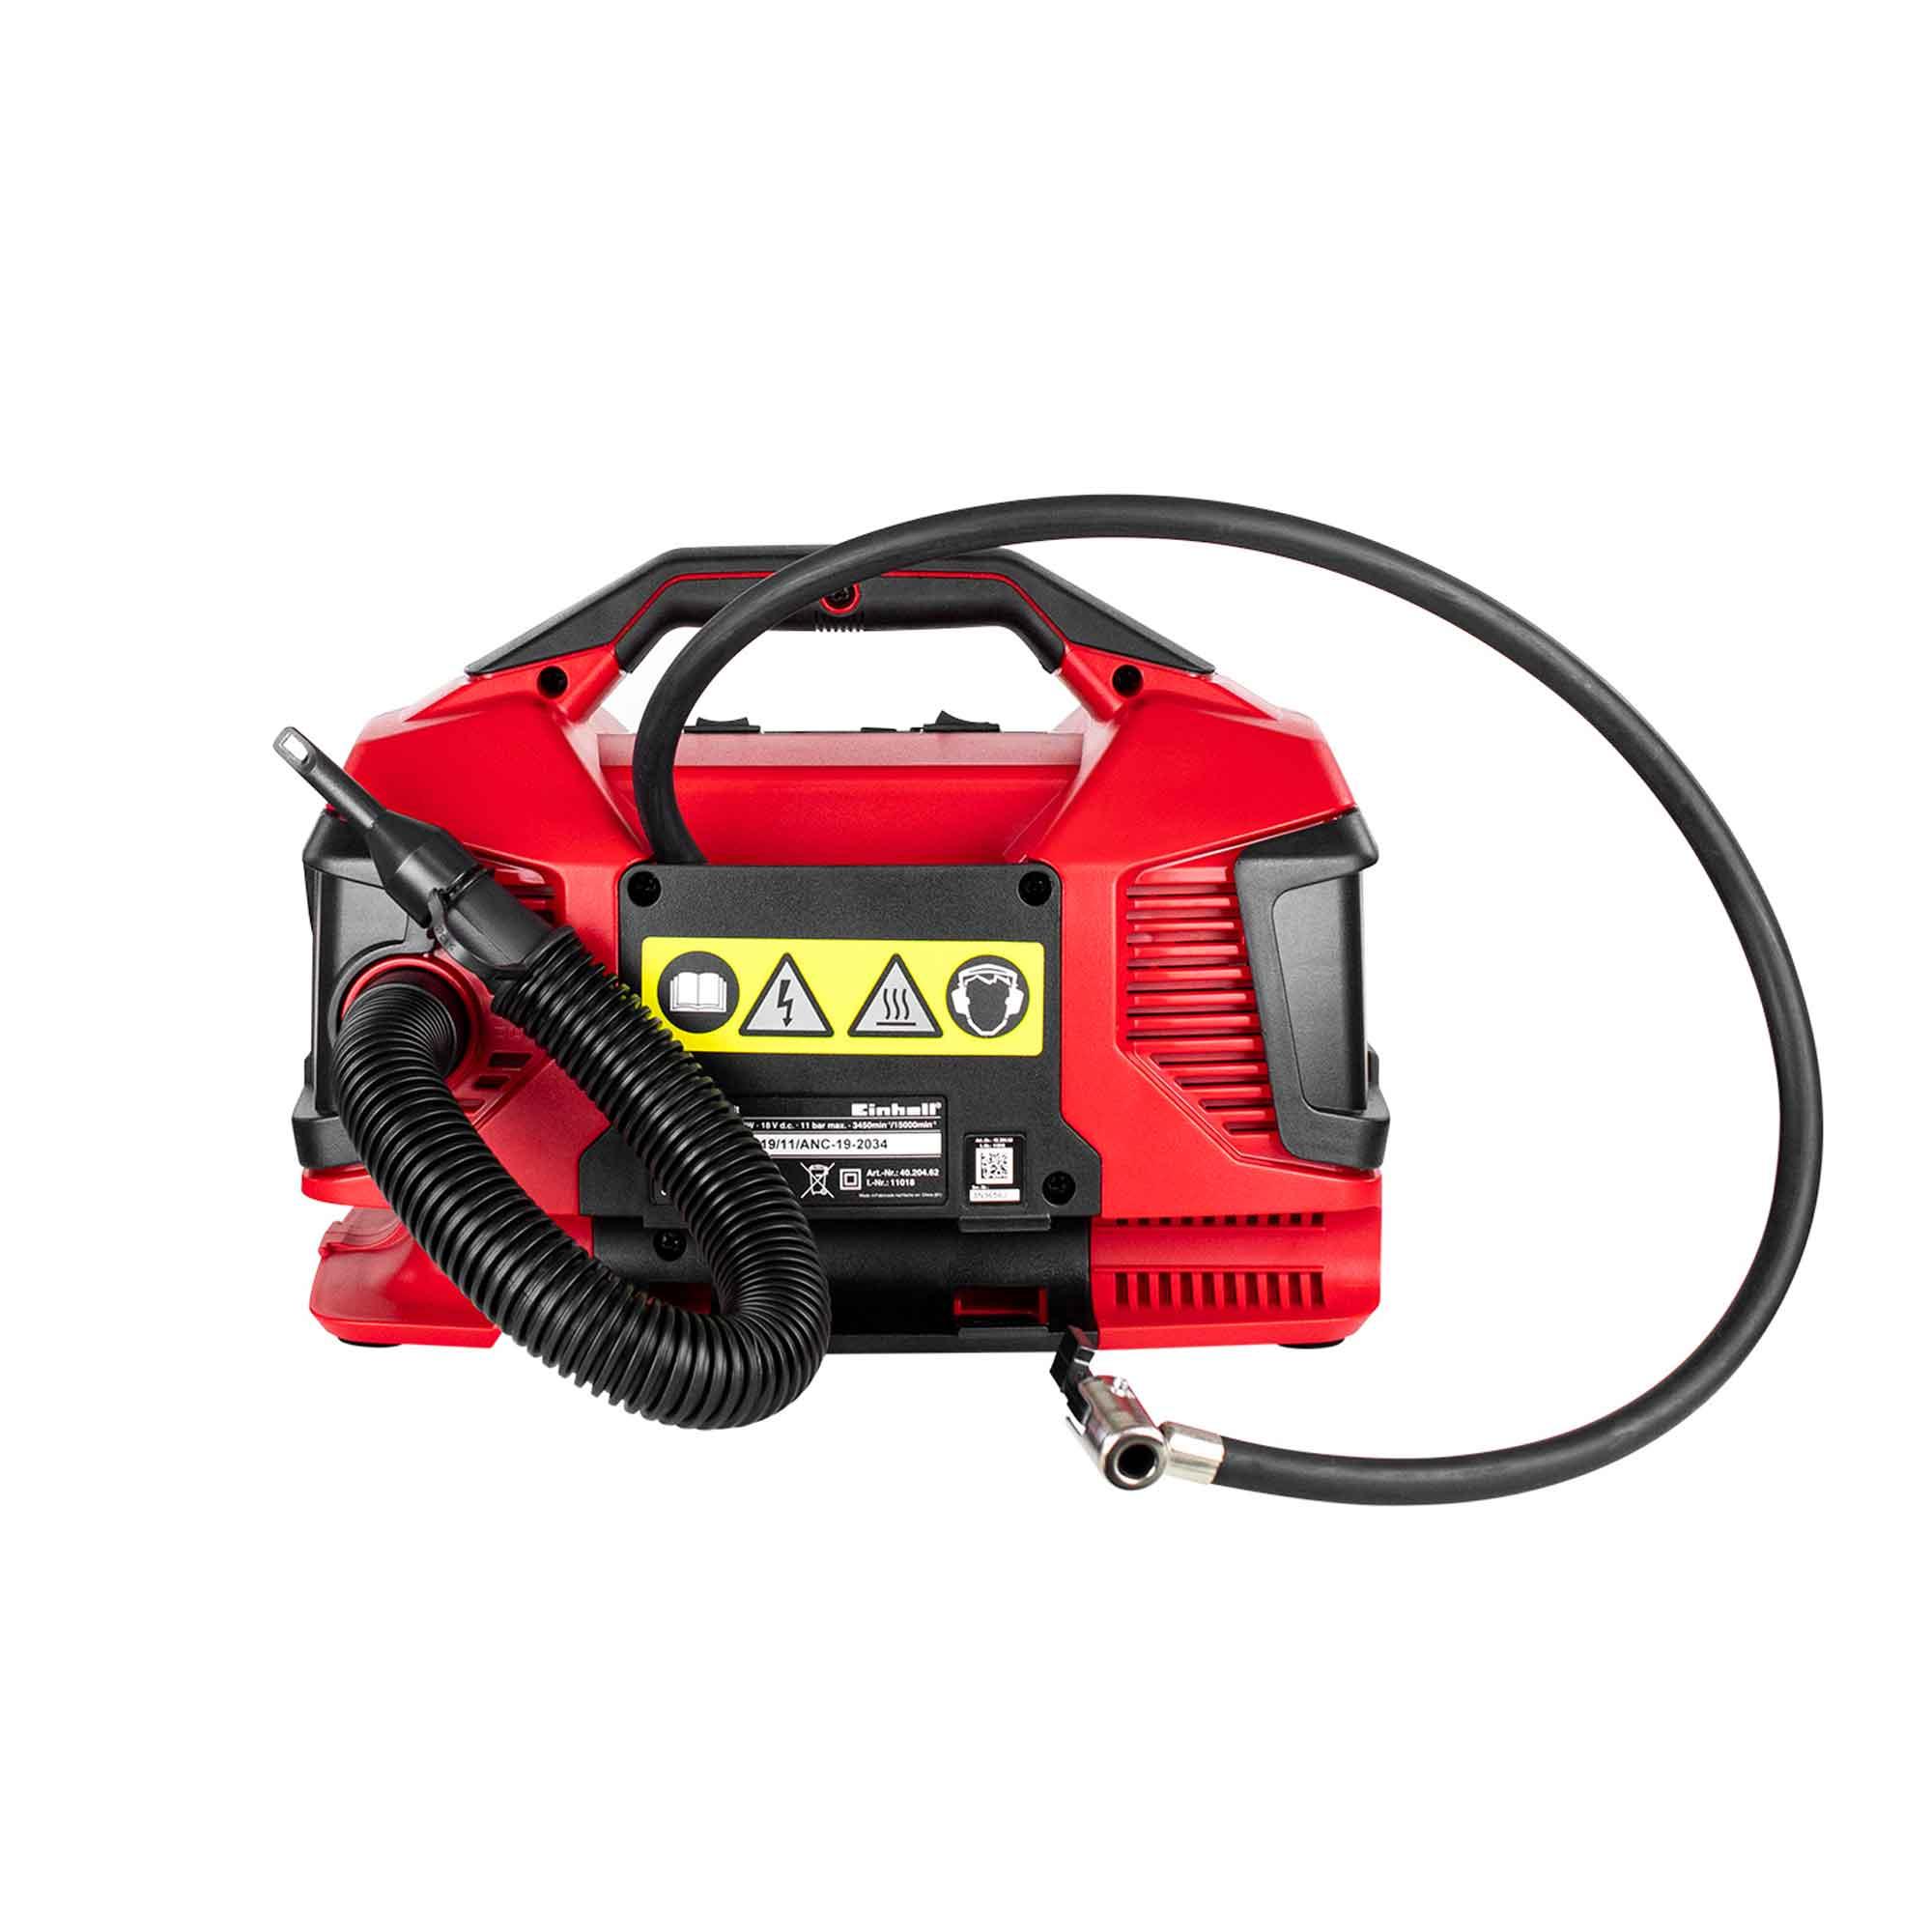 Compressor Híbrido Pressito Einhell a Bateria / Energia Bivolt